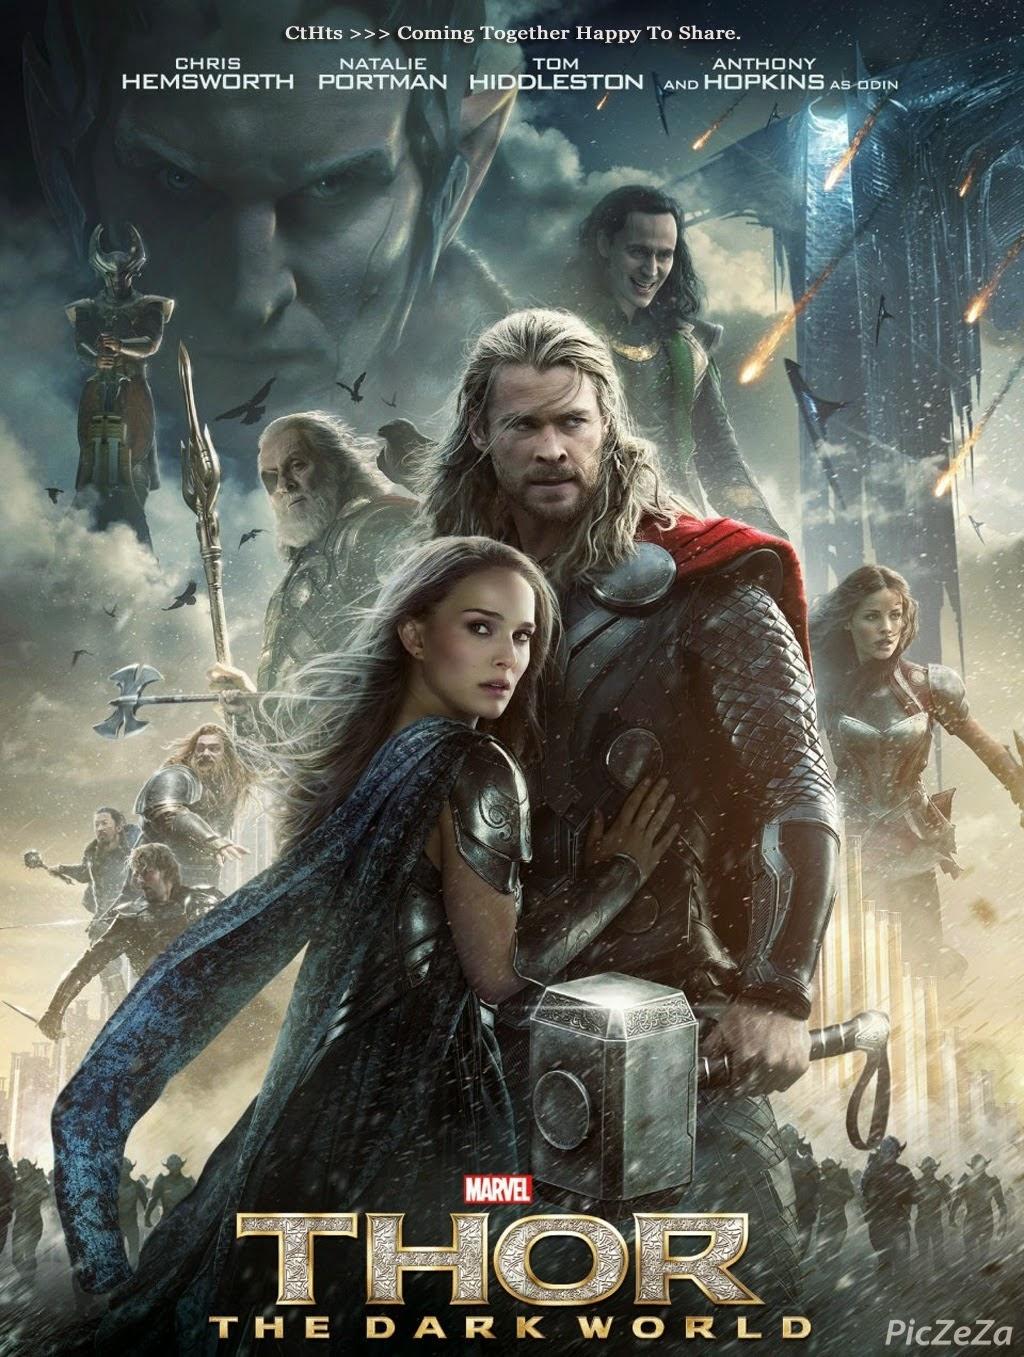 Thor : The Dark World (2013) | ธอร์ เทพเจ้าสายฟ้าโลกาทมิฬ